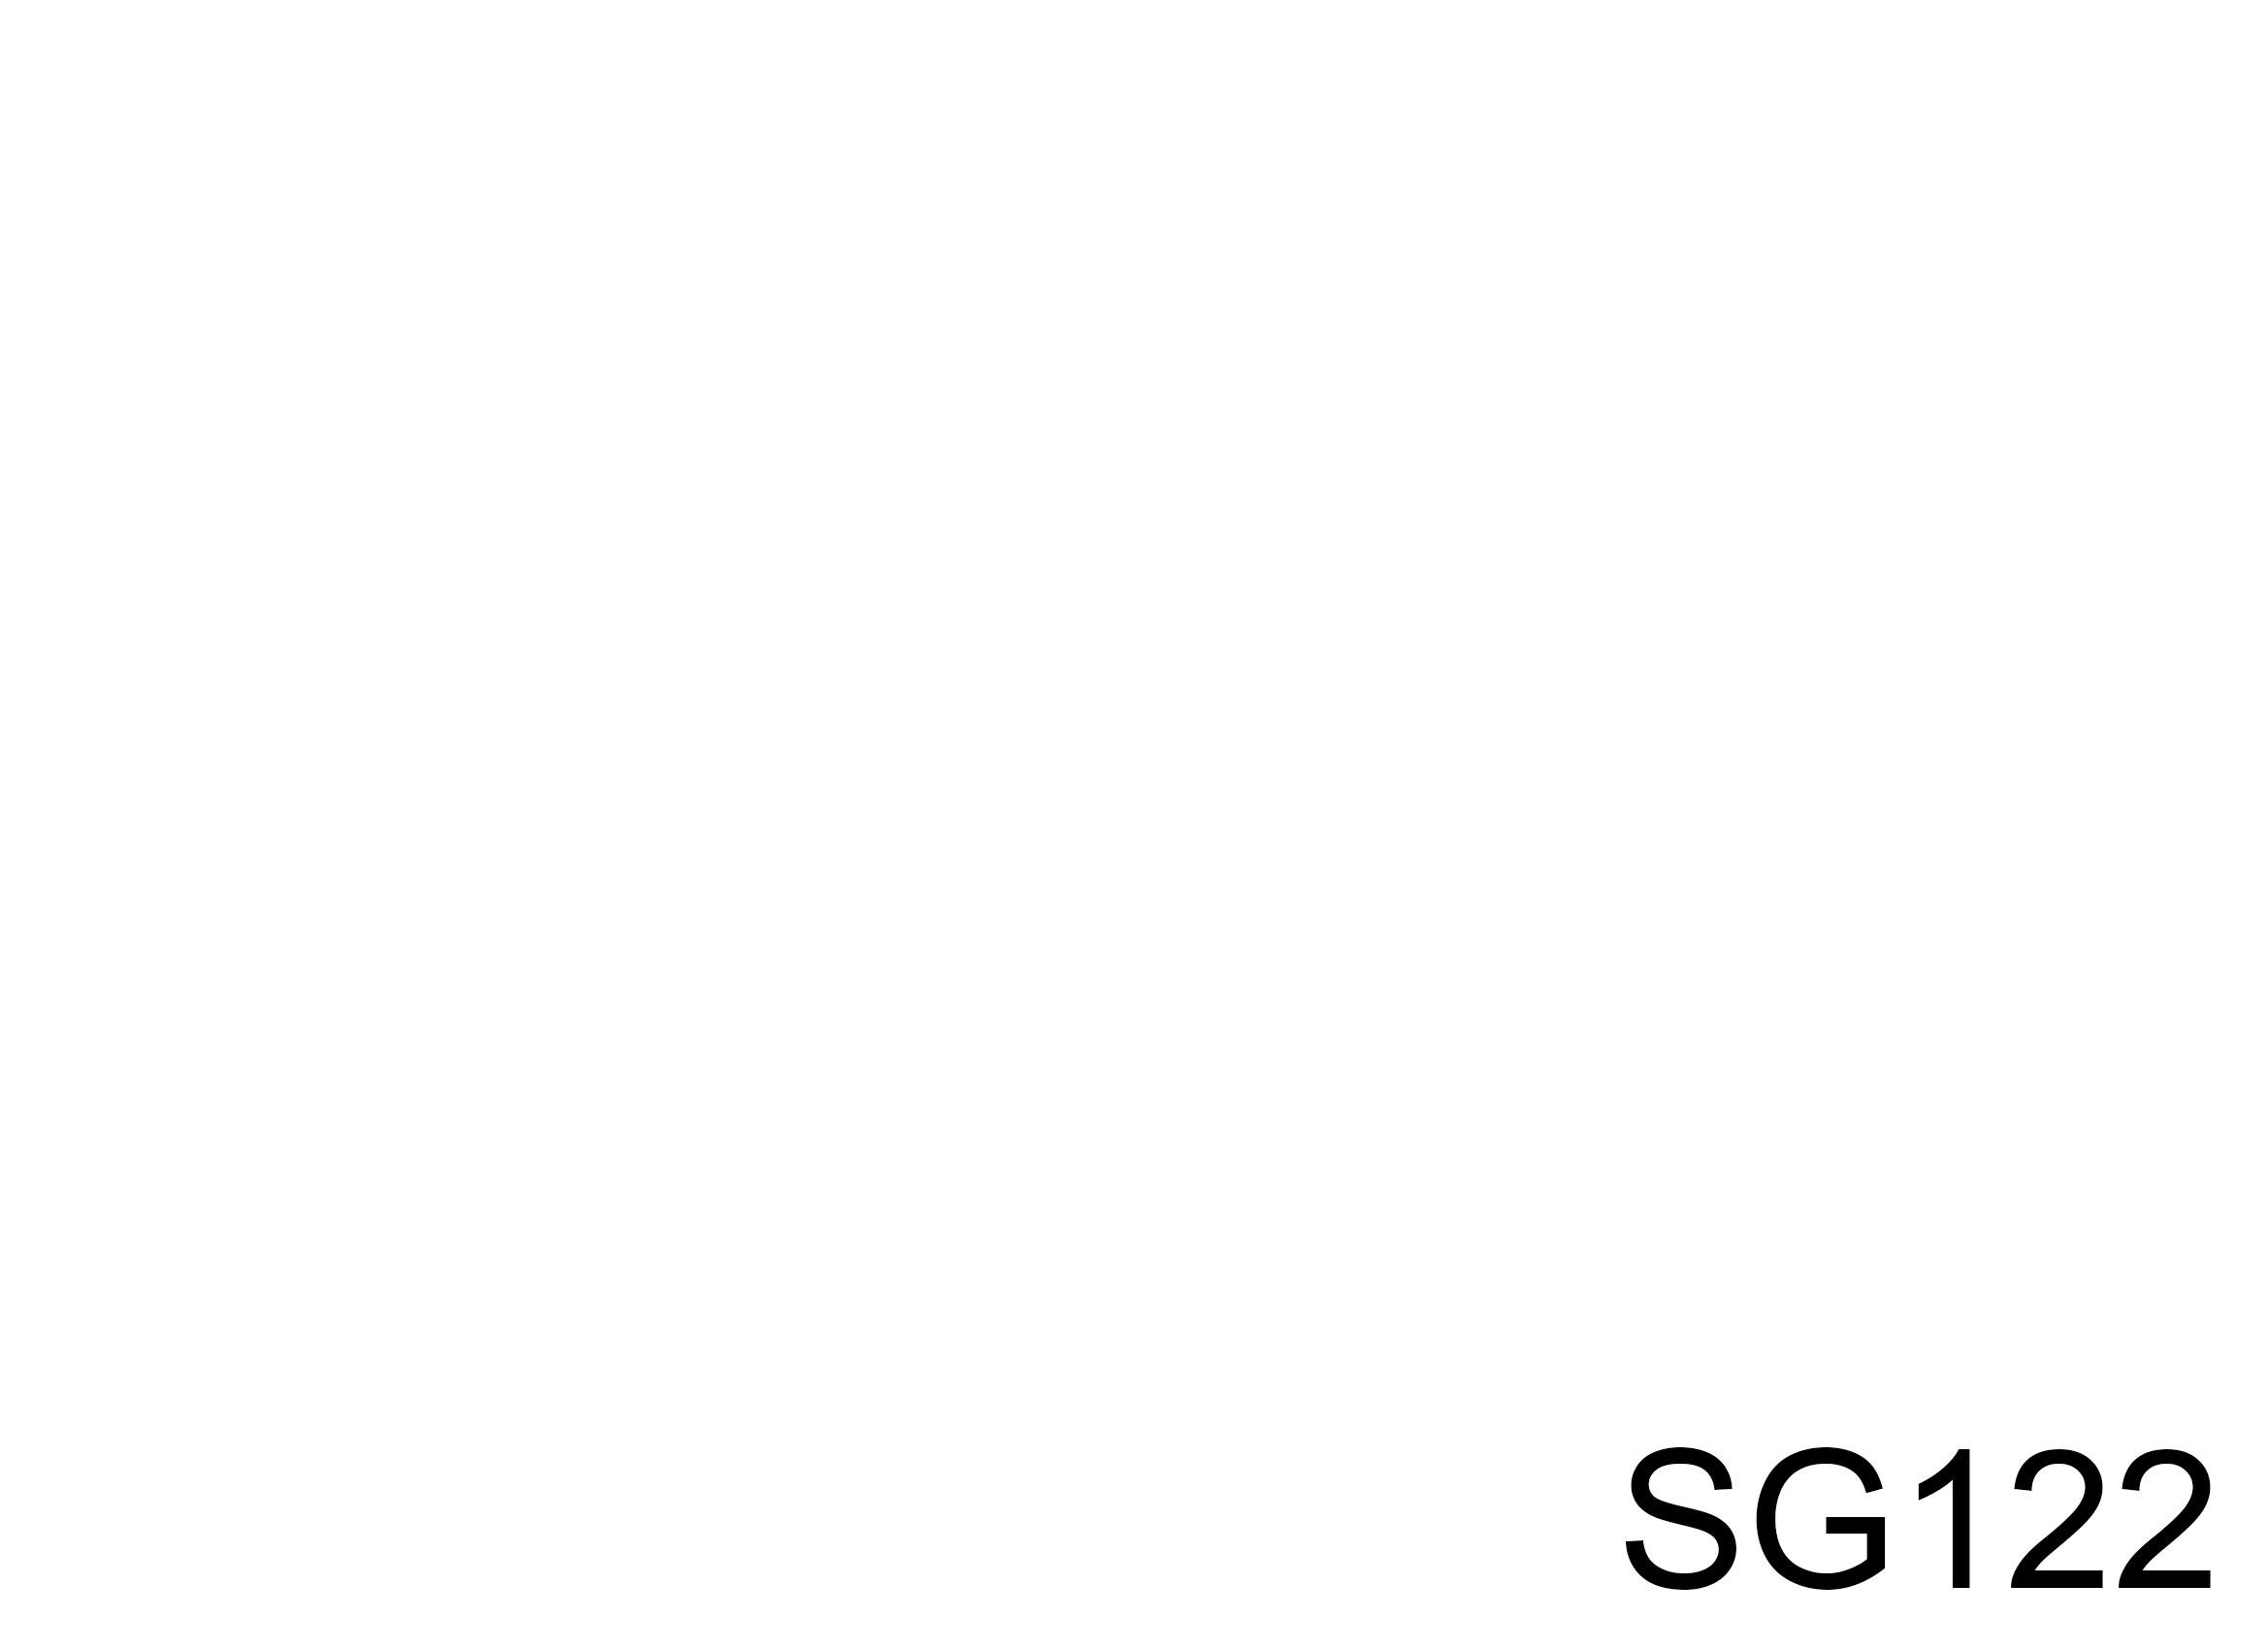 SG122